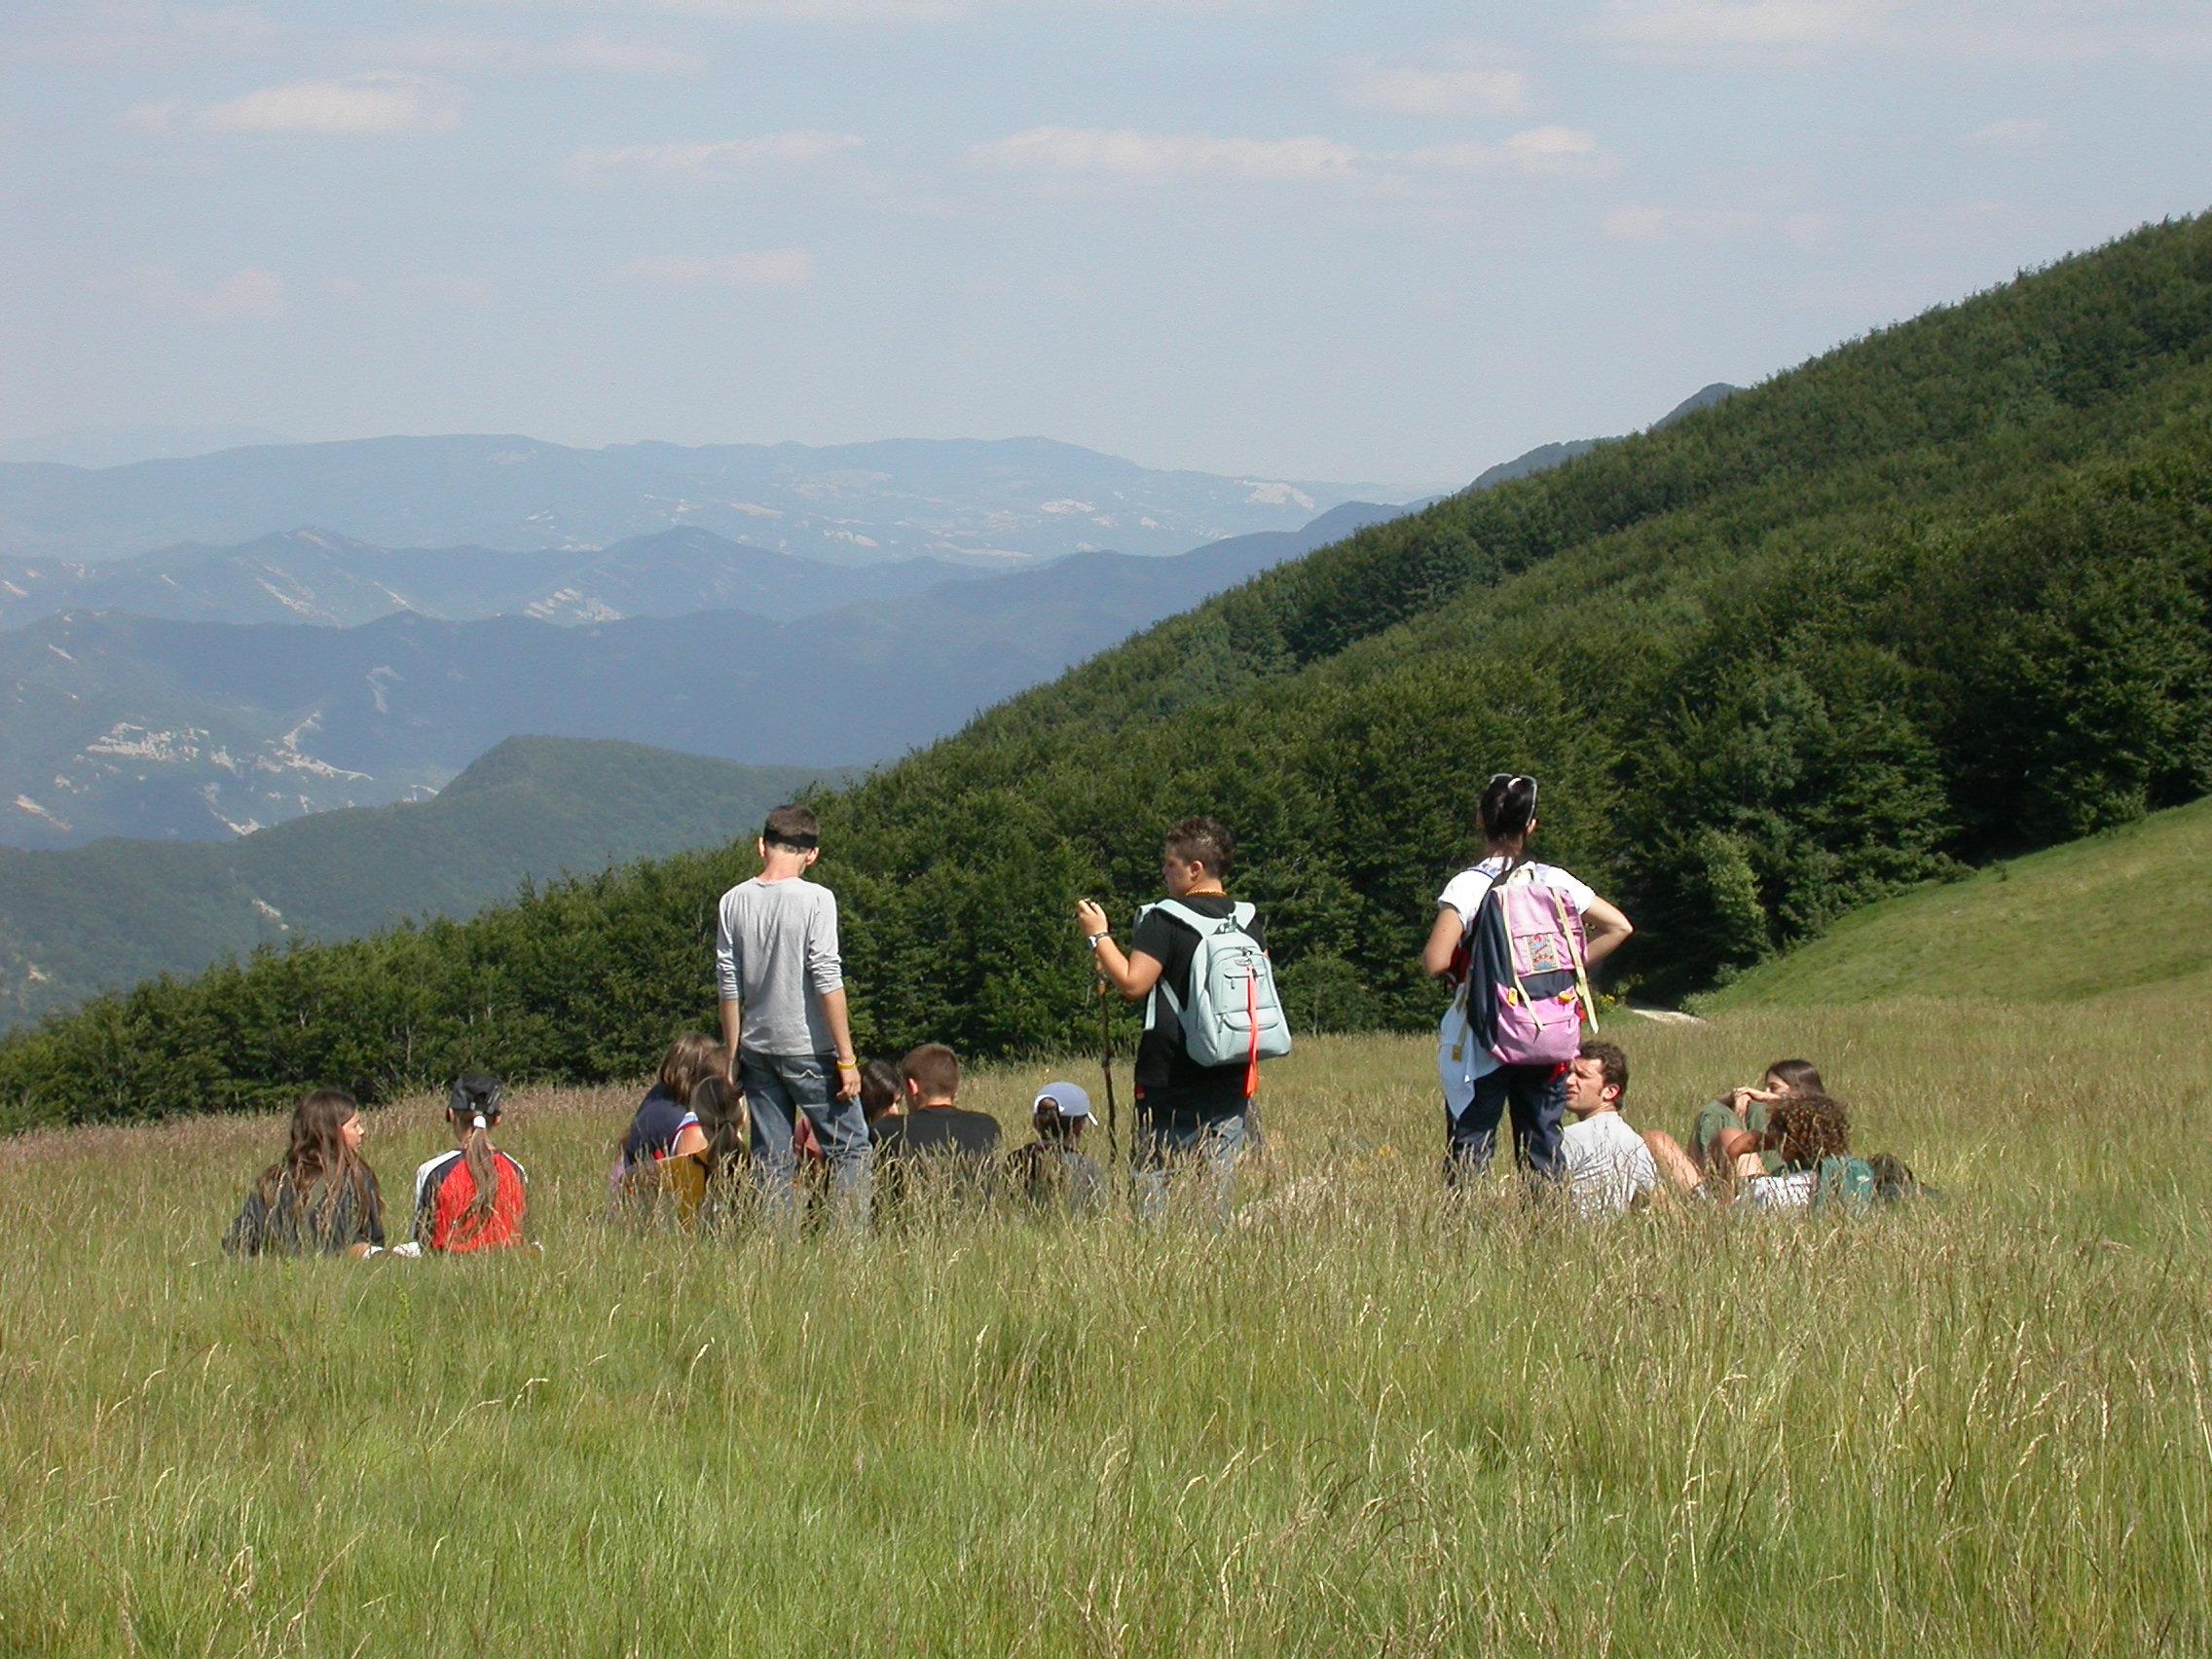 Campi estivi per ragazzi | Parco Nazionale Foreste Casentinesi